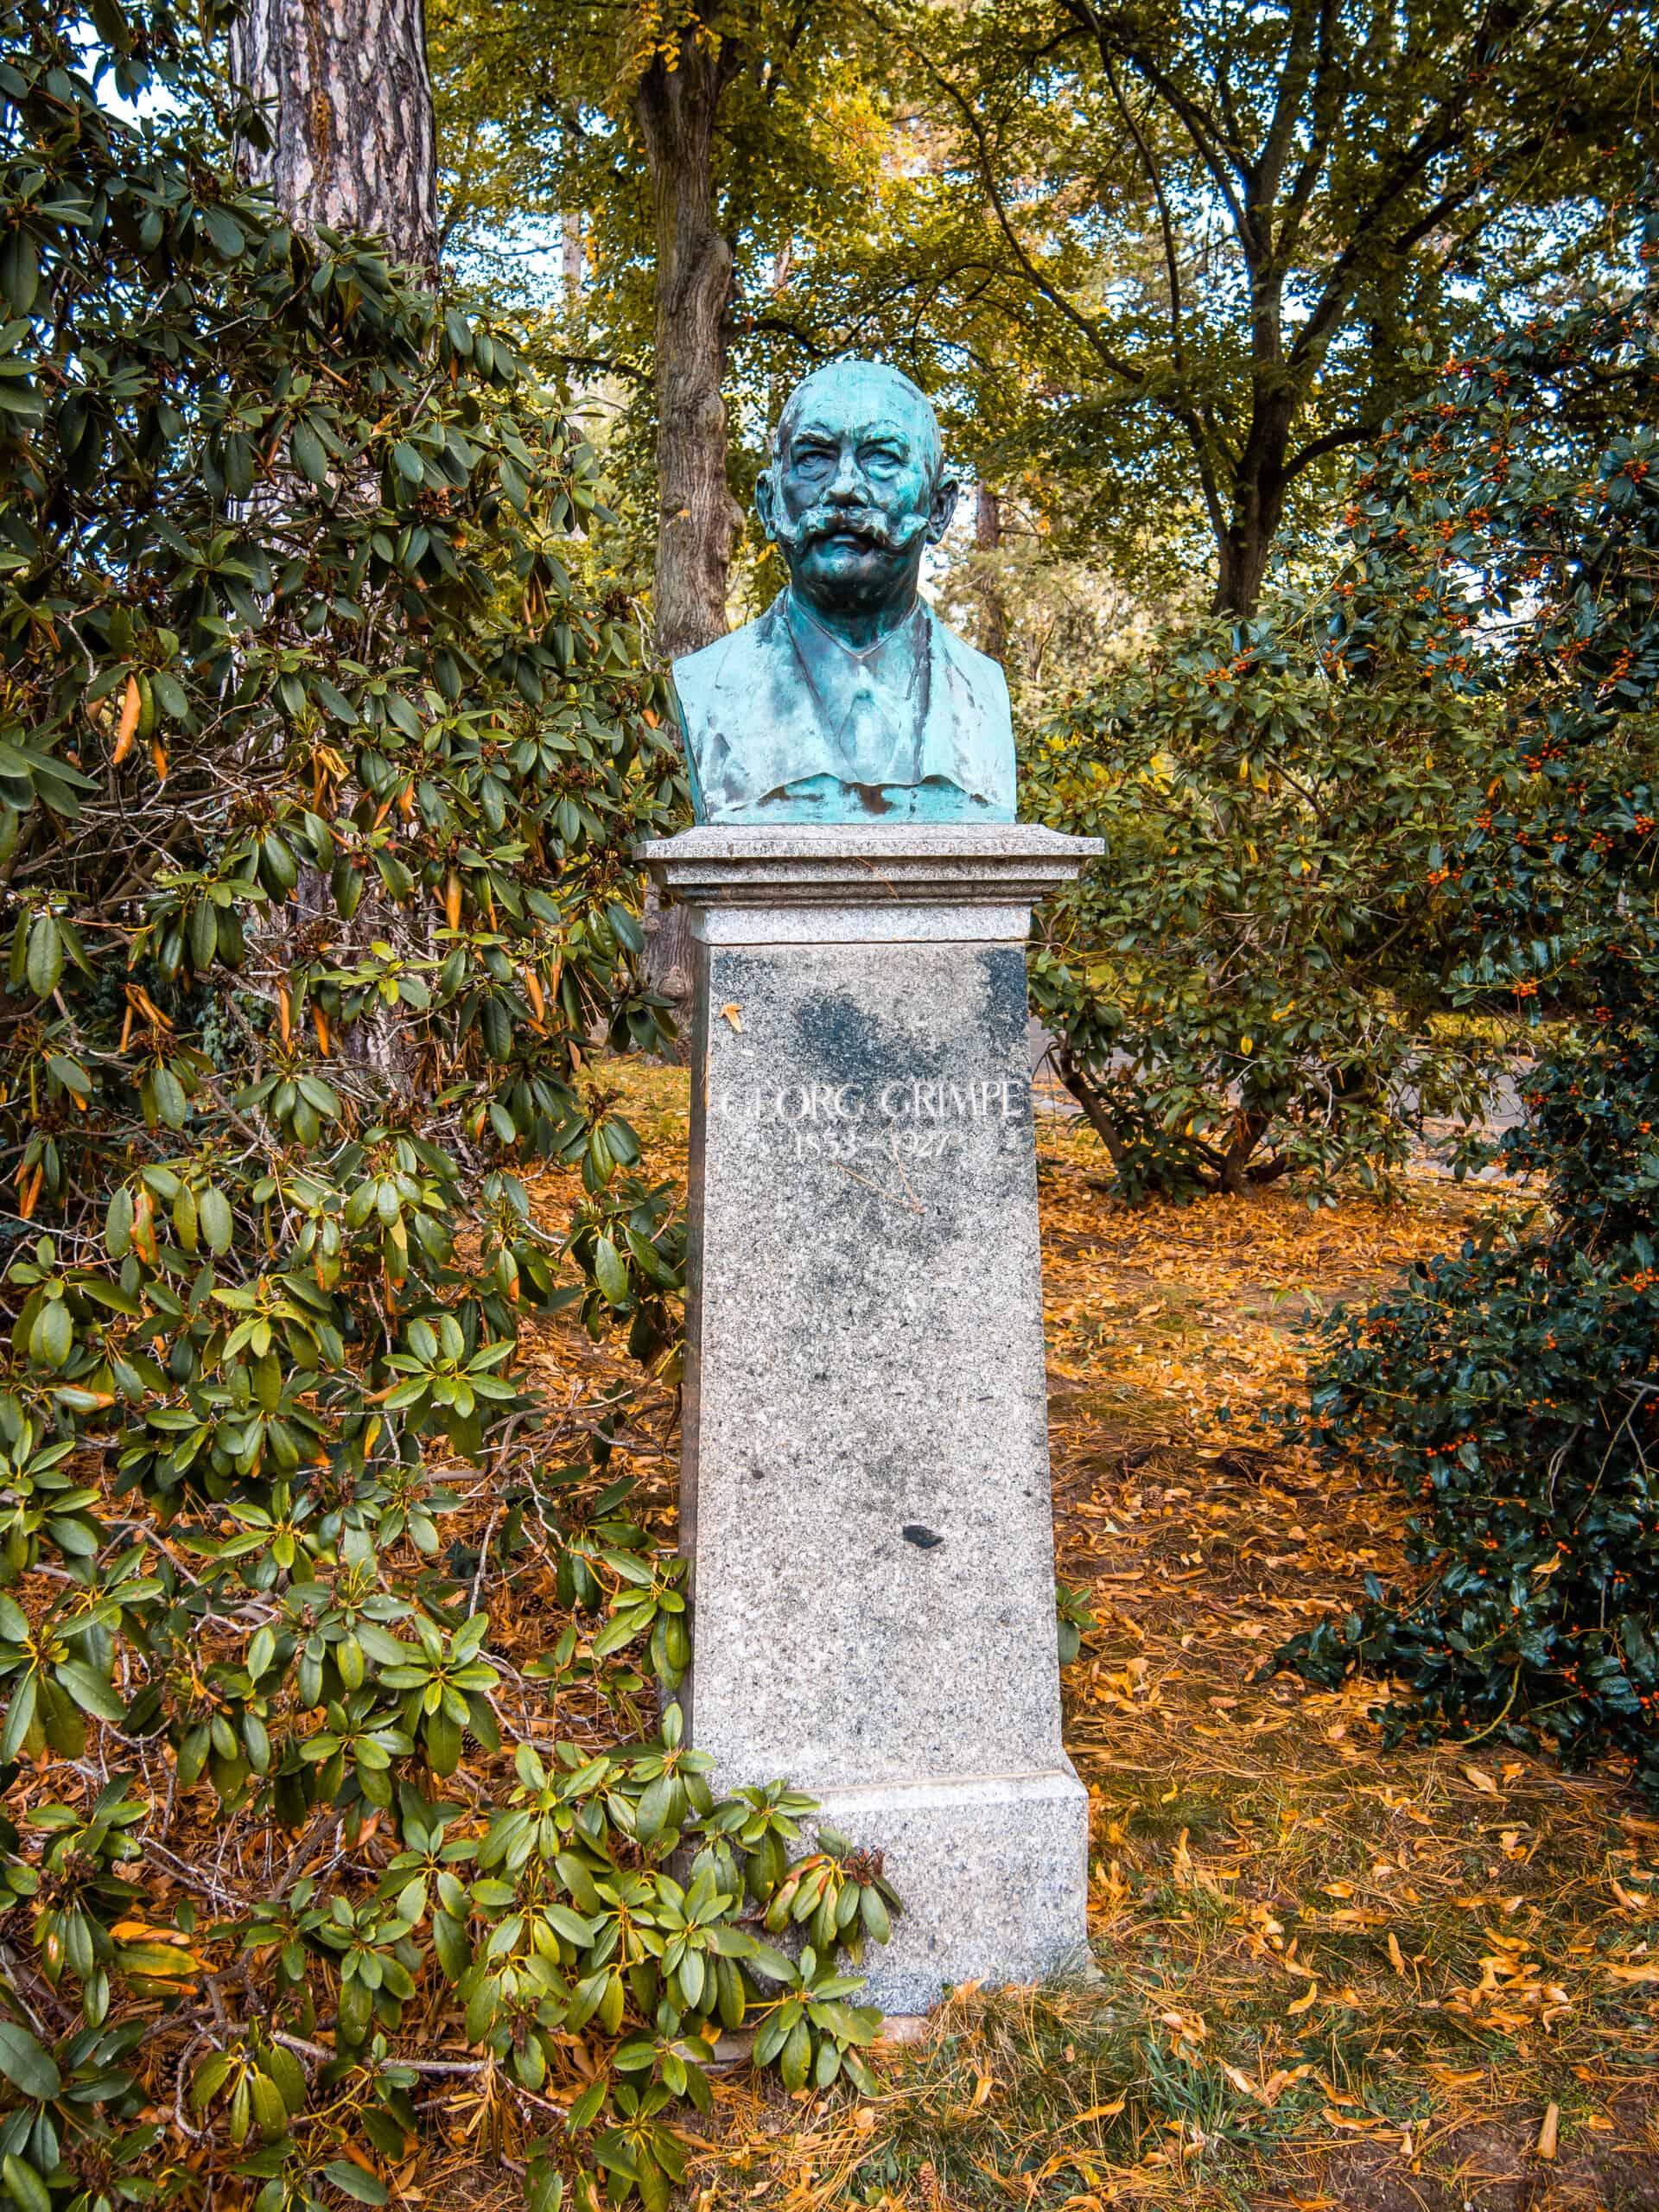 Südfriedhof Leipzig I Free Walking Tour Leipzig I www.leipzigfreetours.com